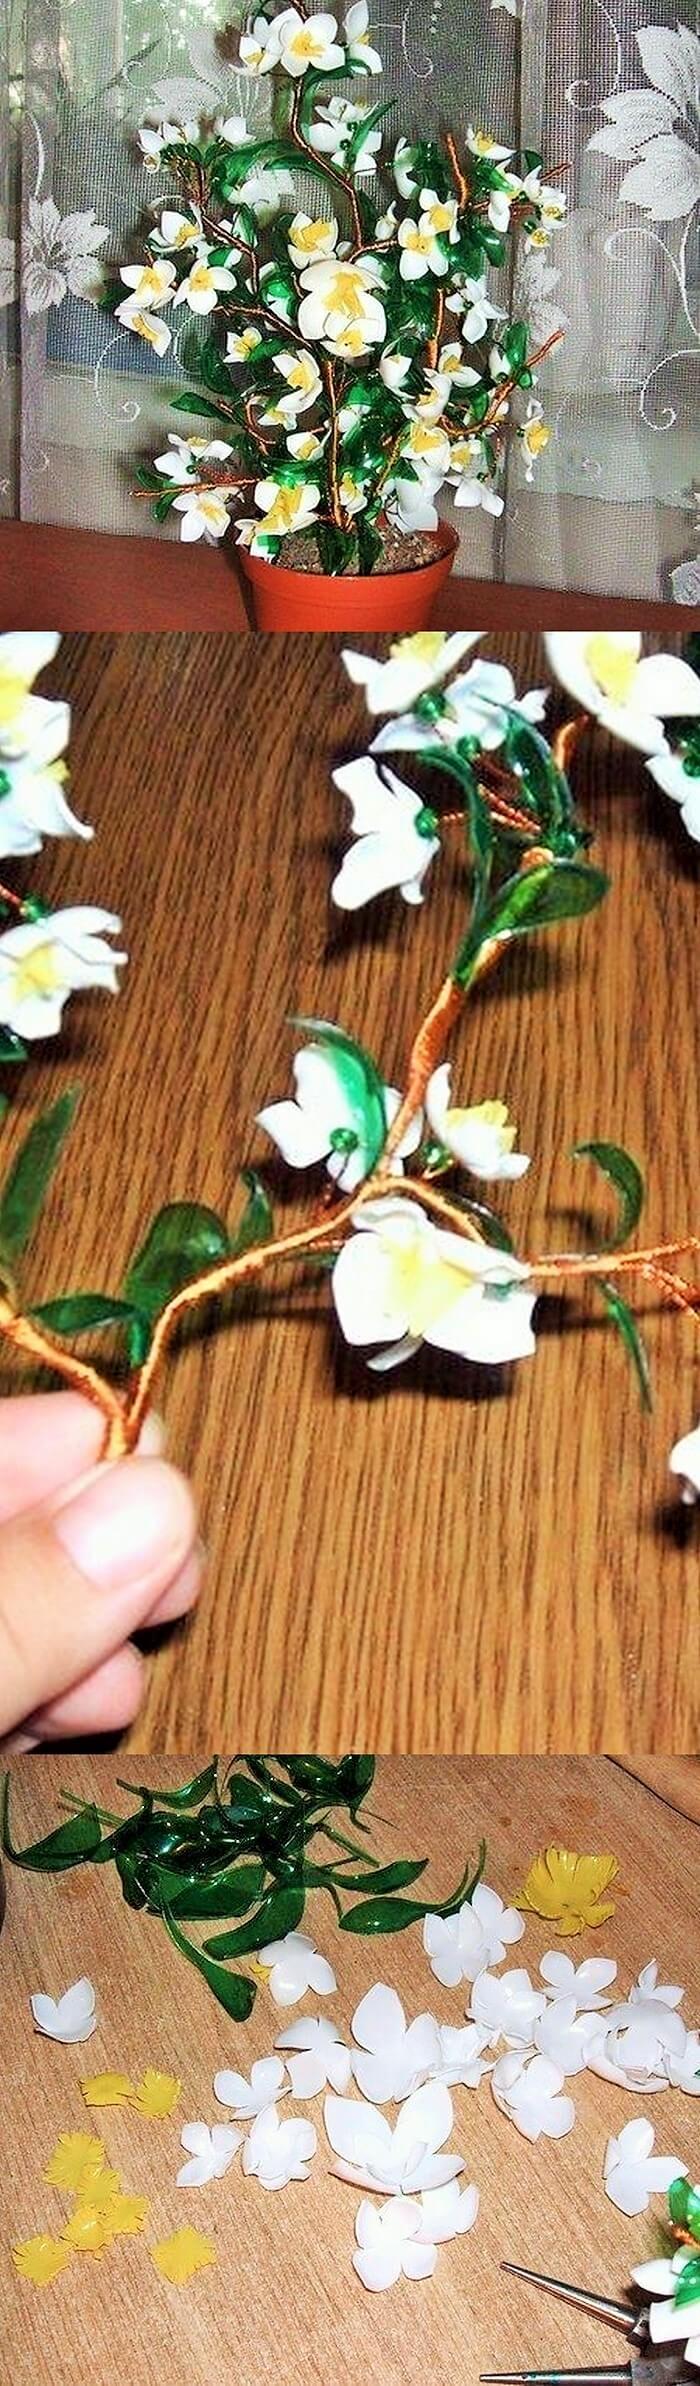 Homemade crafts Ideas-5